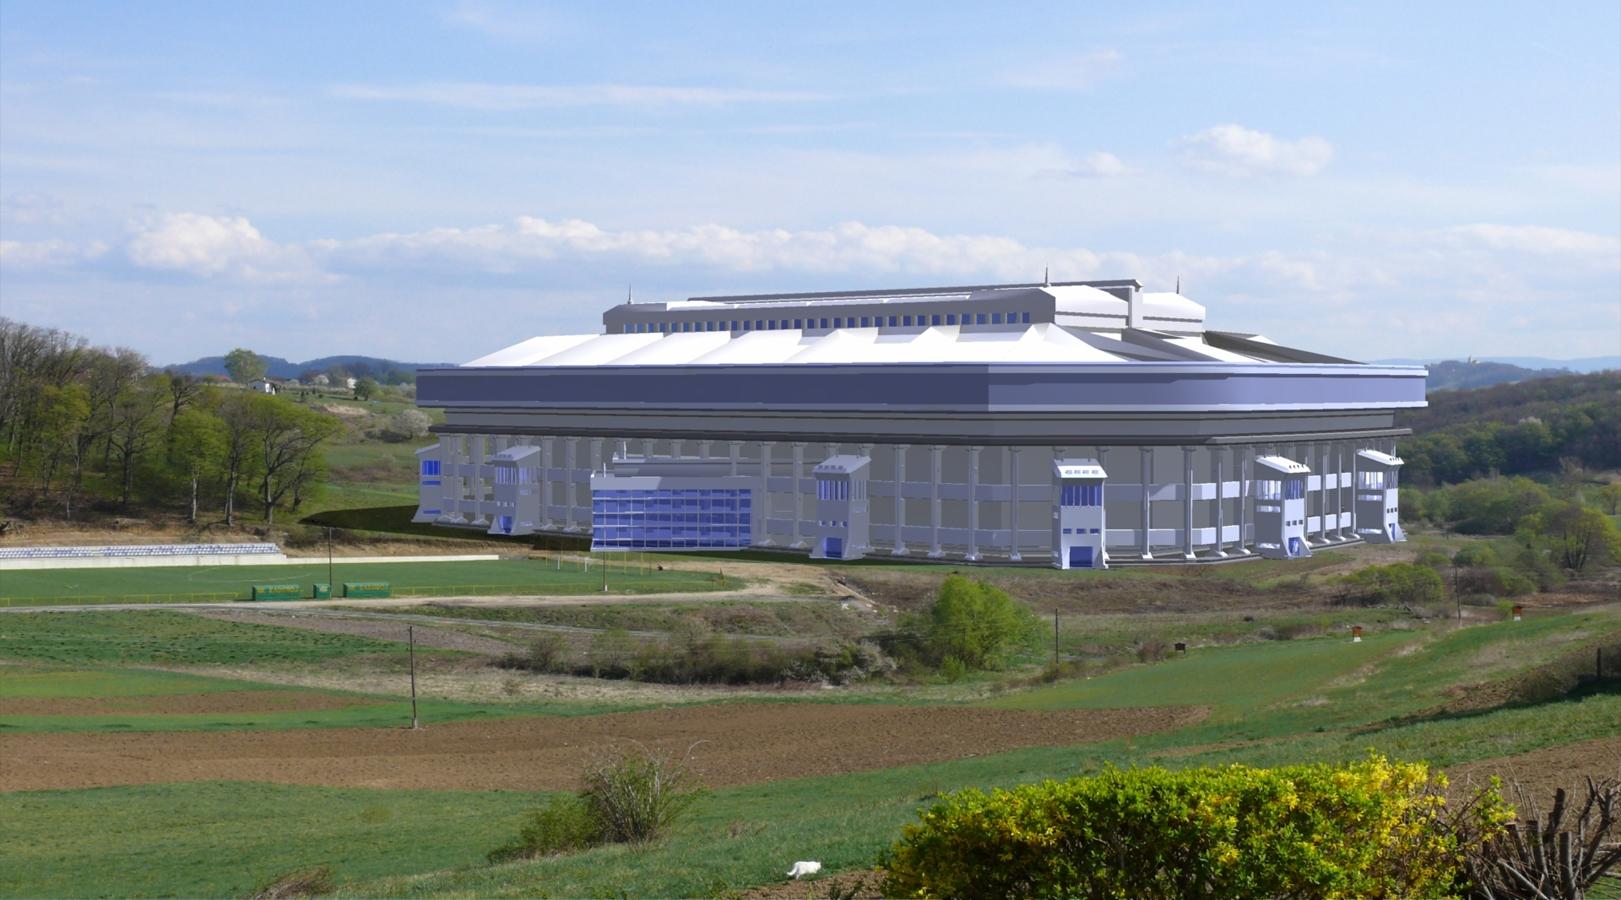 Moderni sportsko-rekreacijski centar